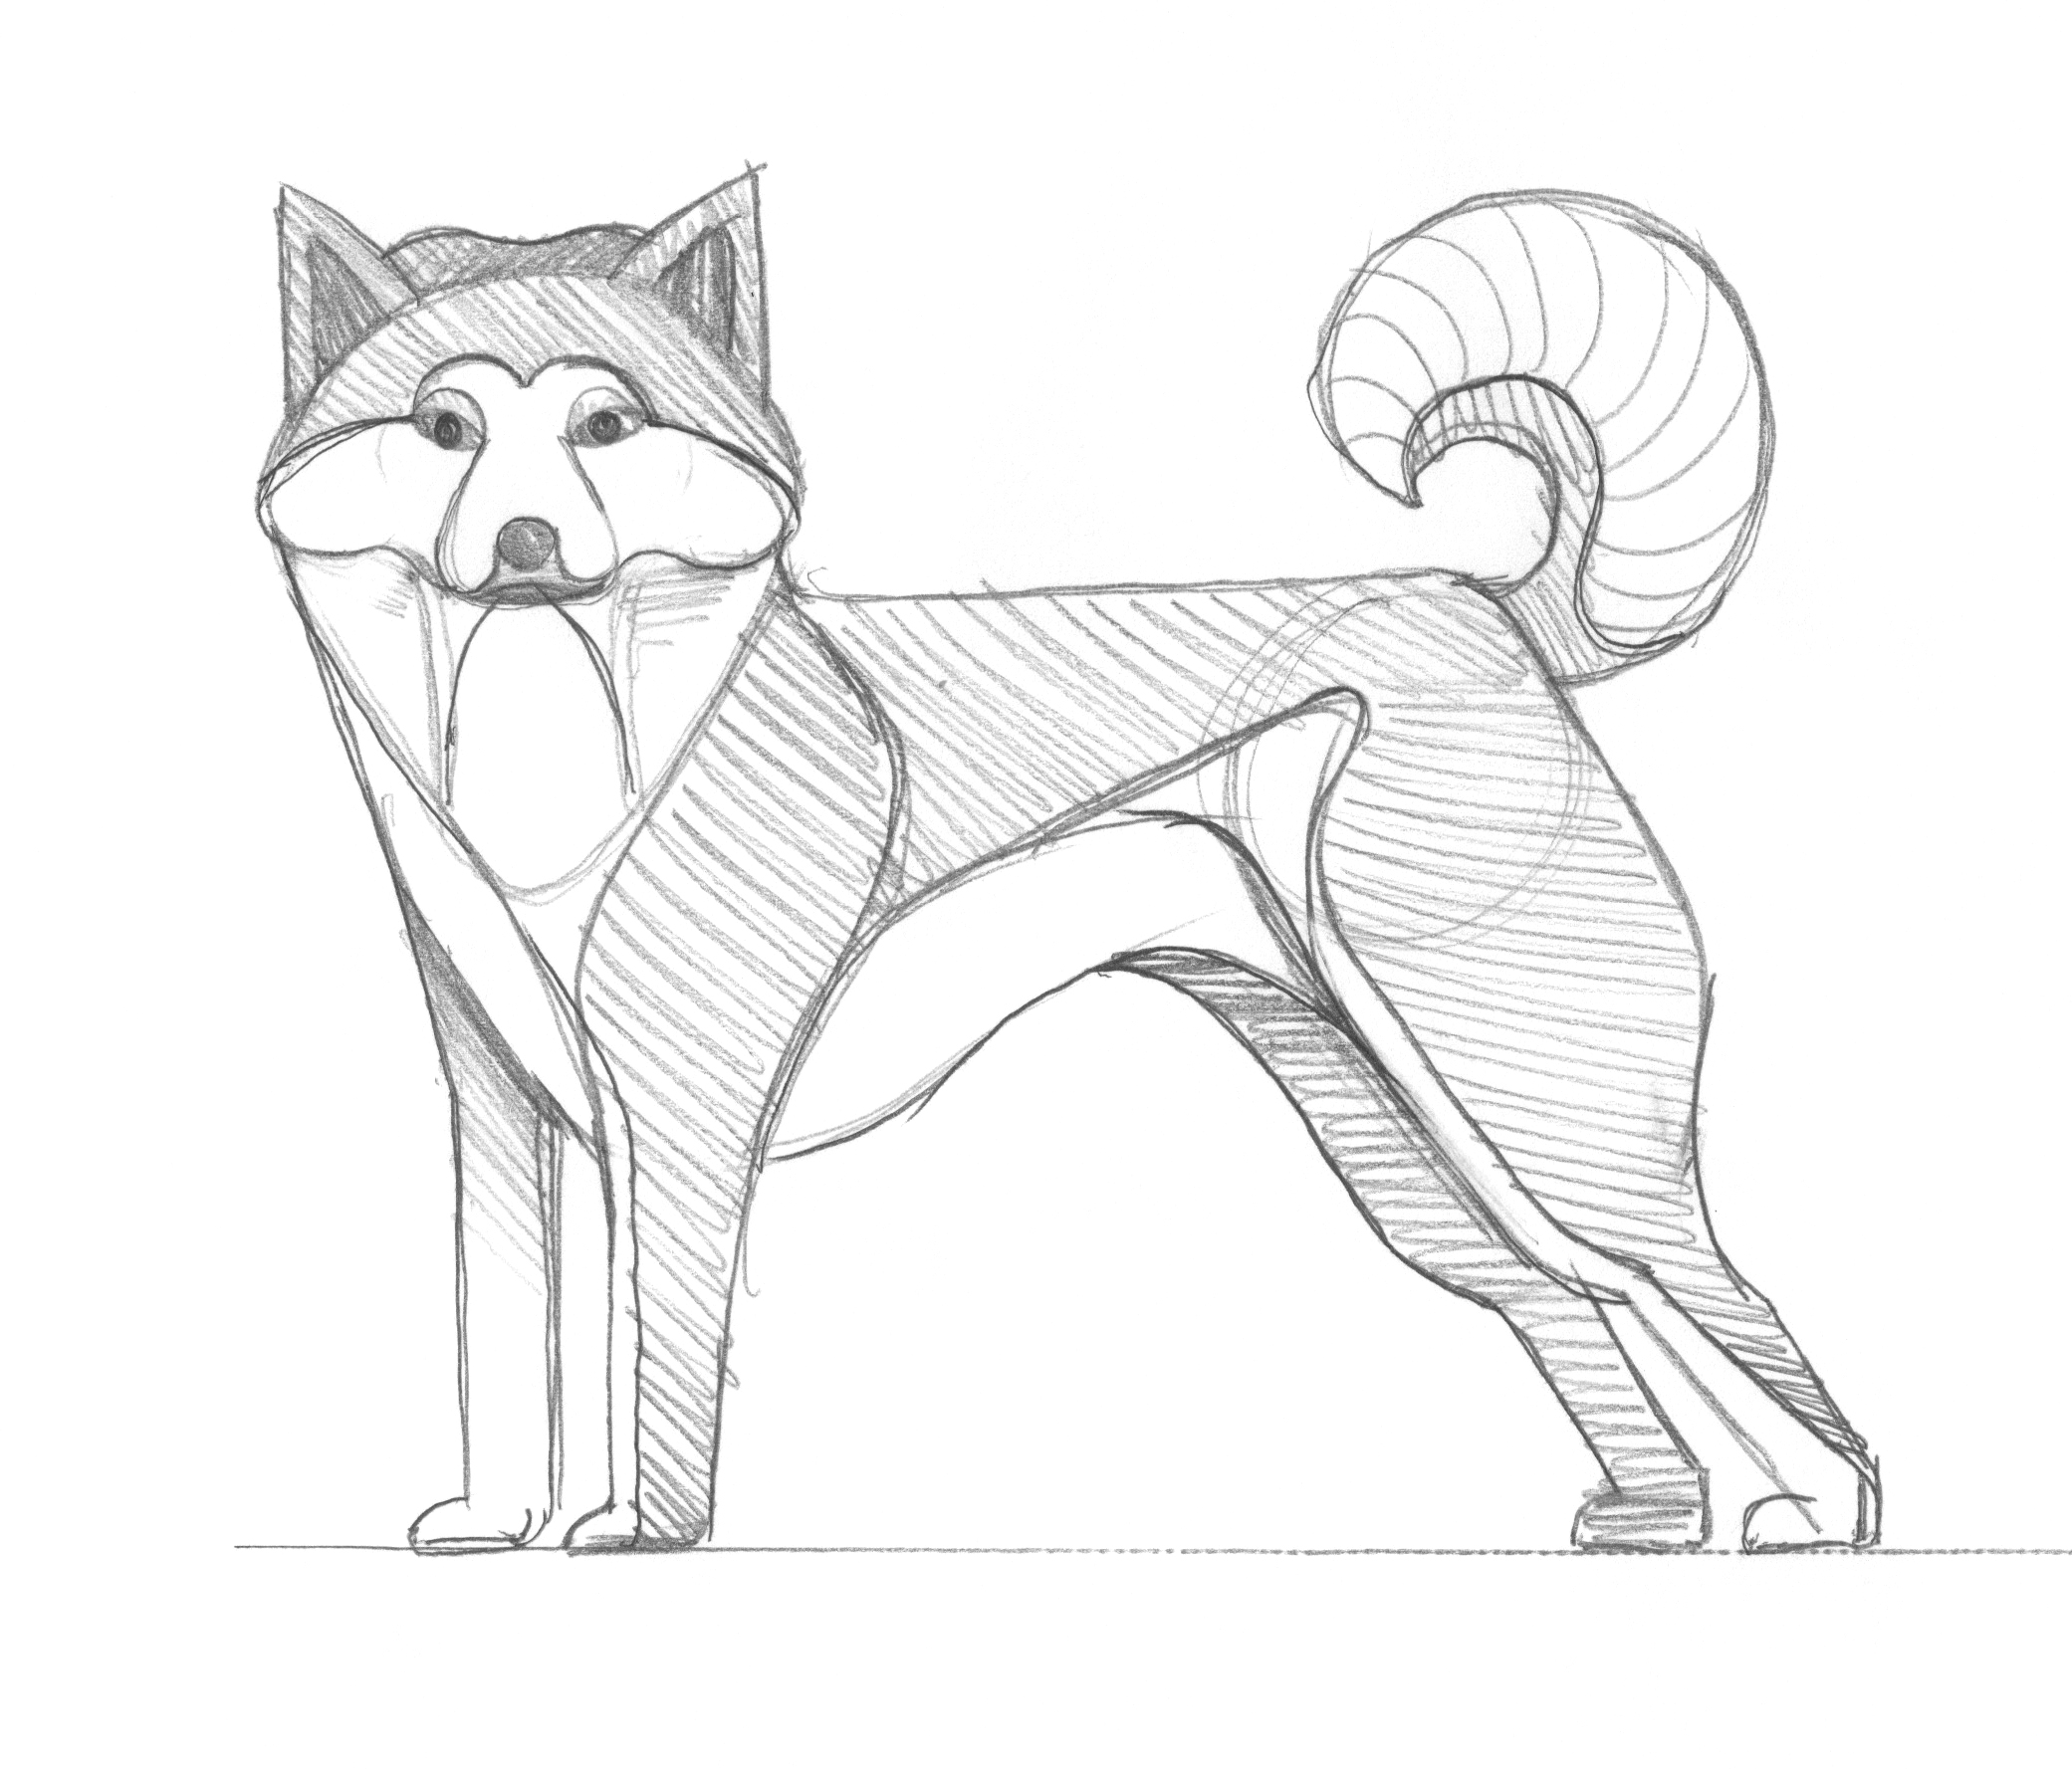 Shiba Inu Sketch by DKNG